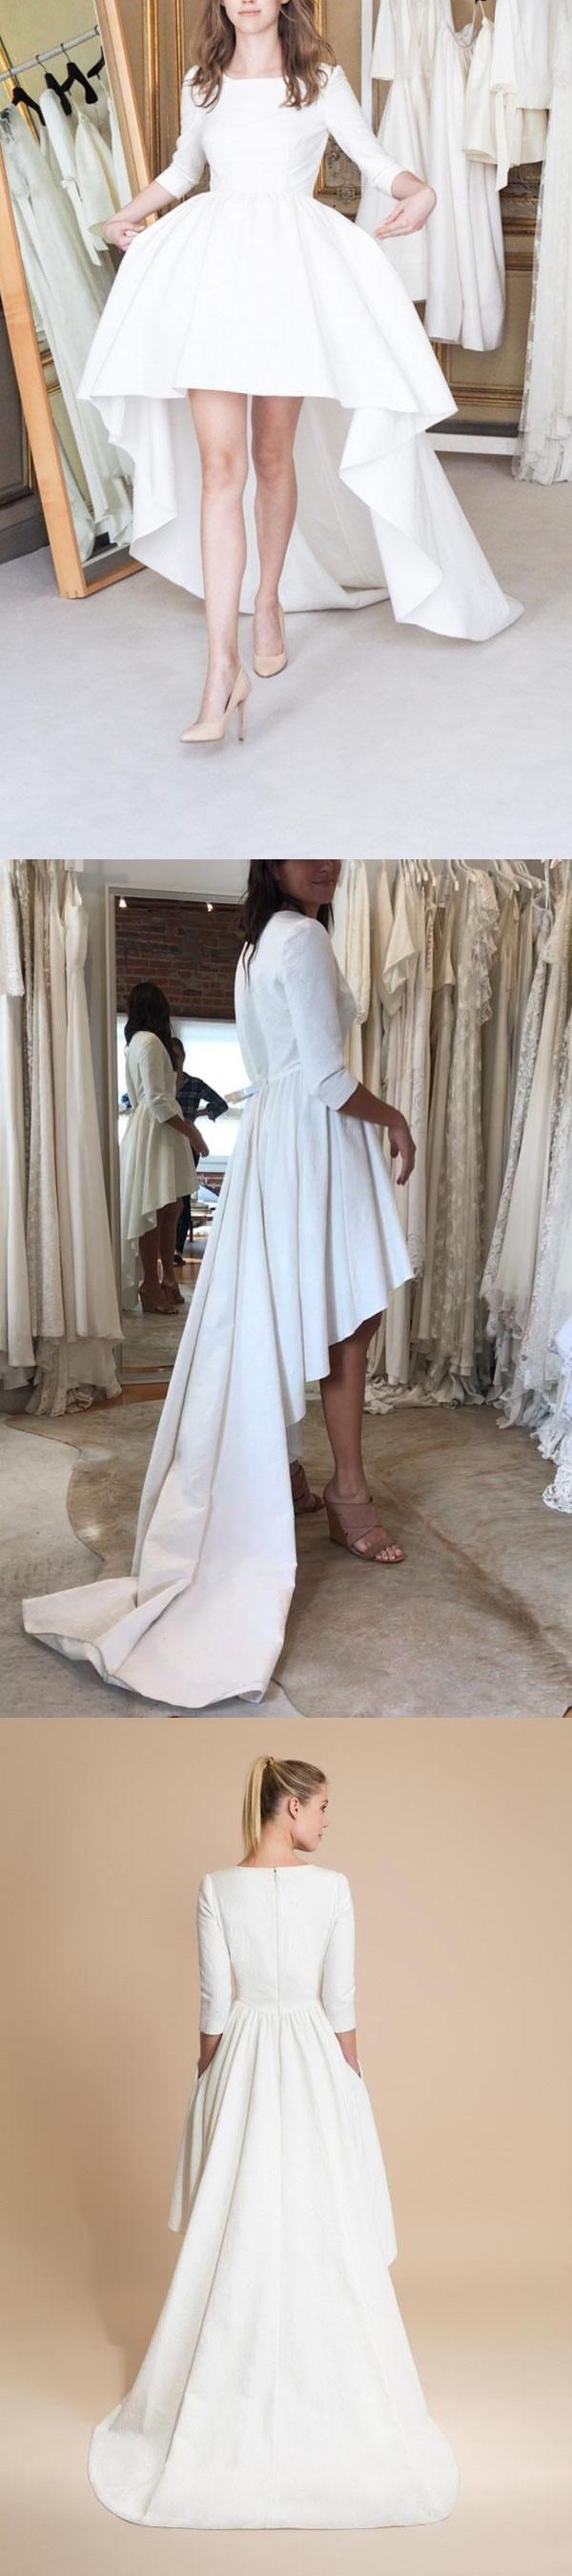 White A Line Asymmetrical 3/4 Sleeve Satin Wedding Dress,Beach Wedding Dress